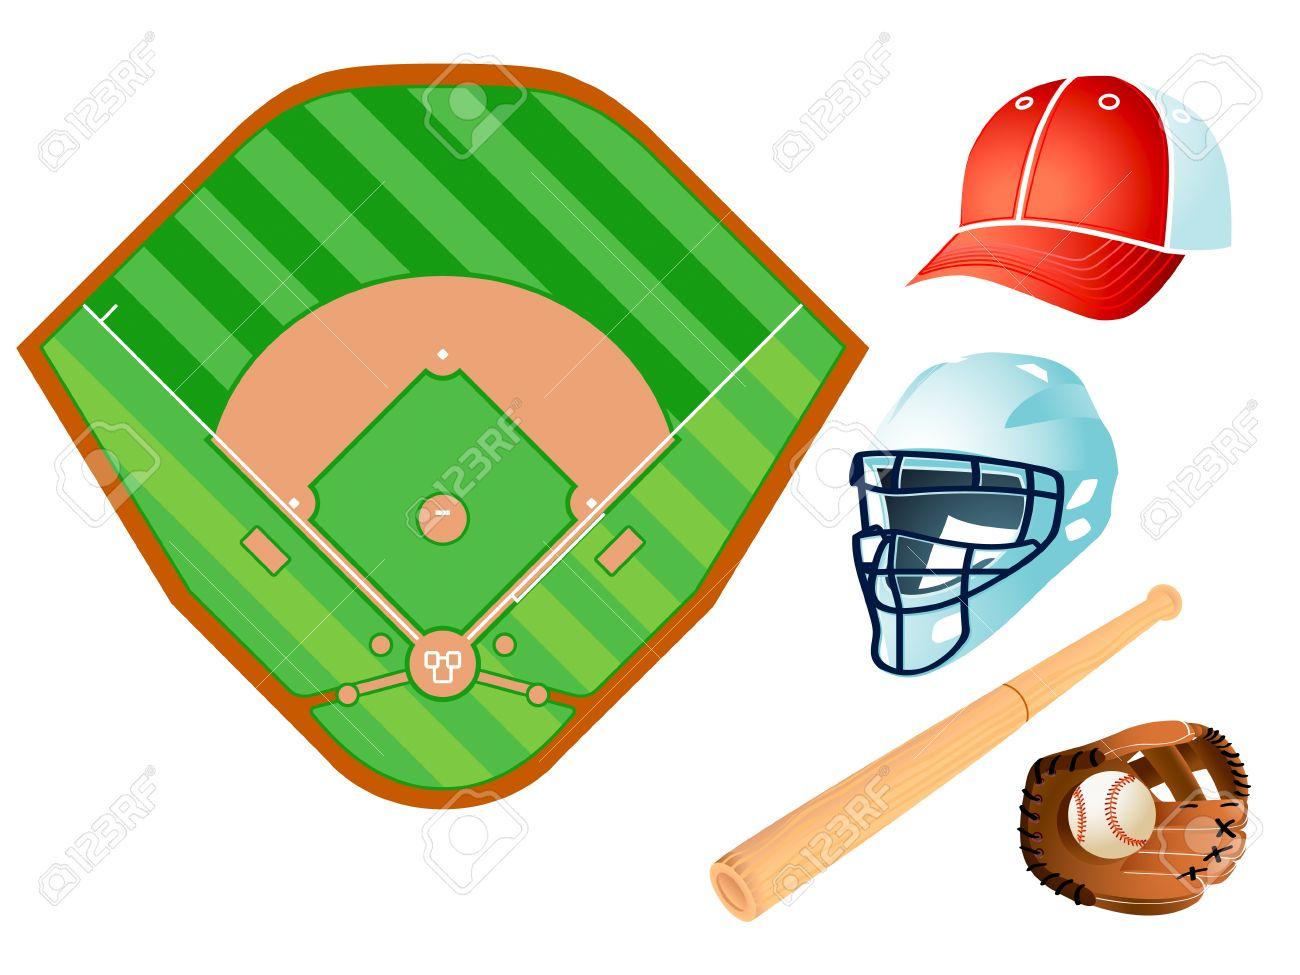 Baseball field layout and bat, helmet, glove, ball and cap Stock Vector - 6654644